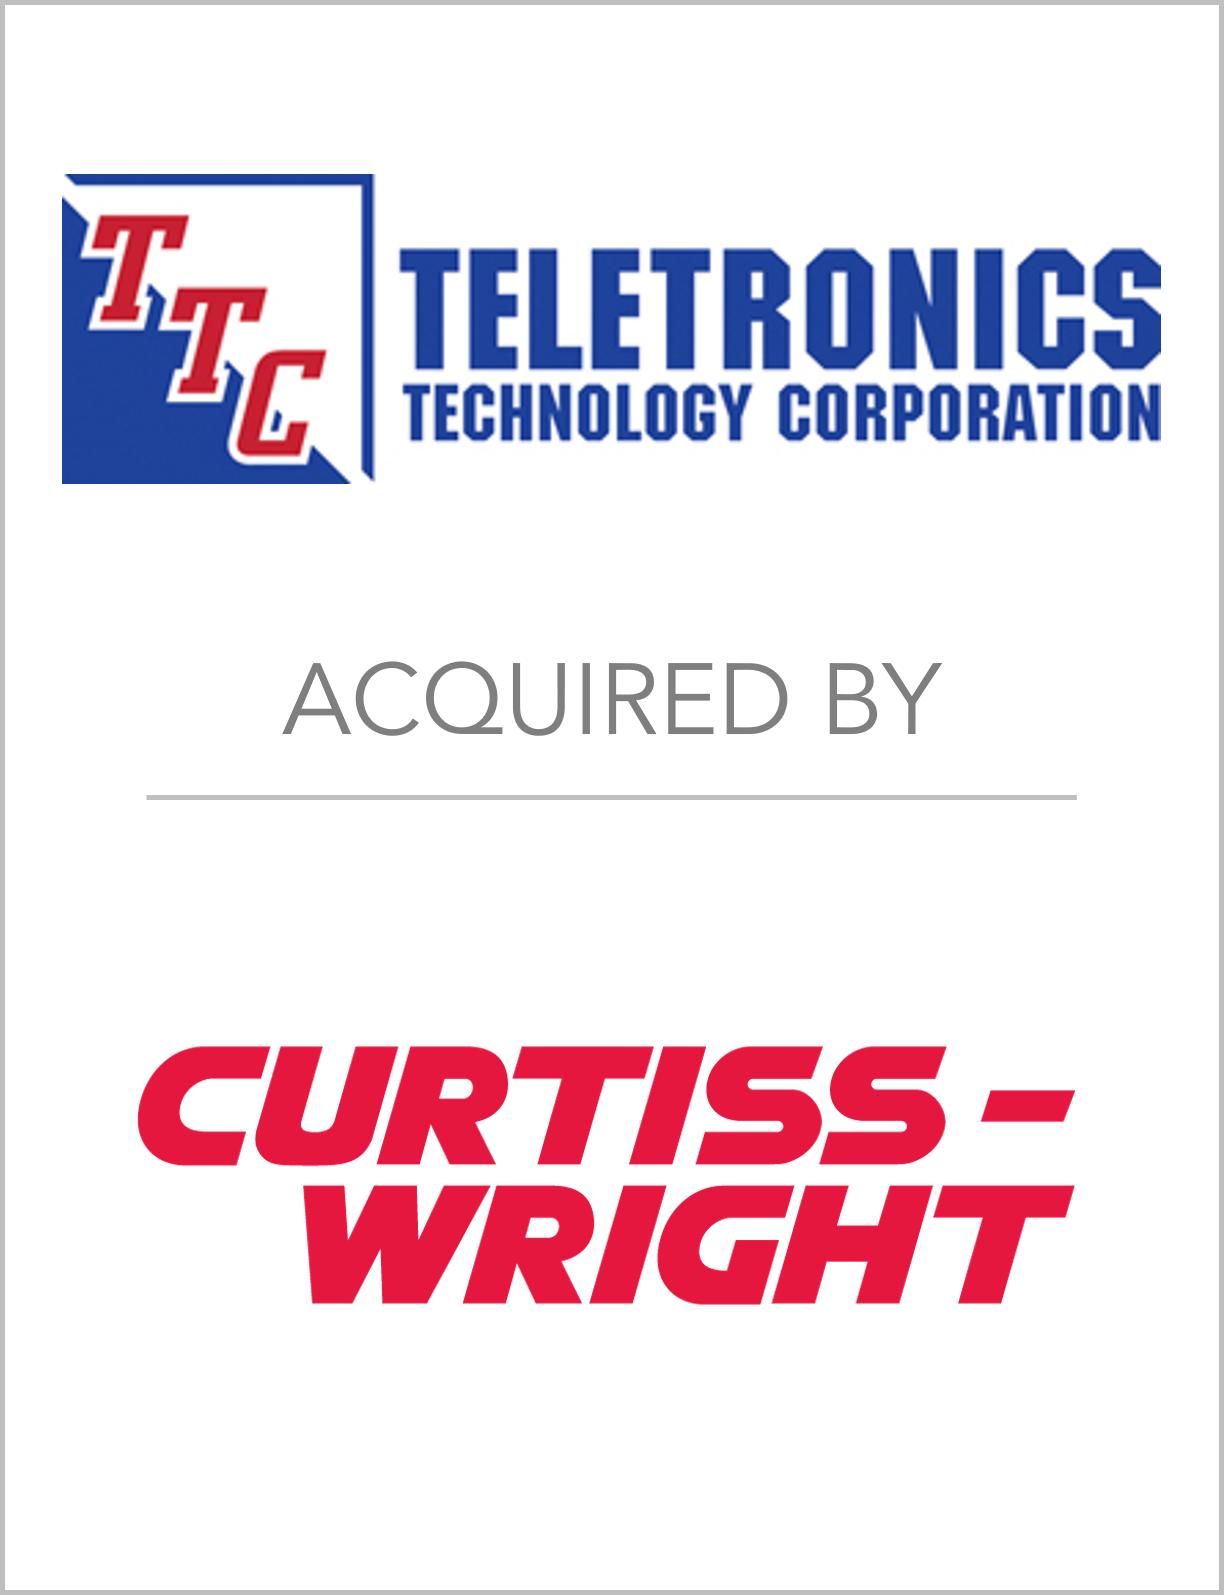 Fairmount Partners Advises Teletroni